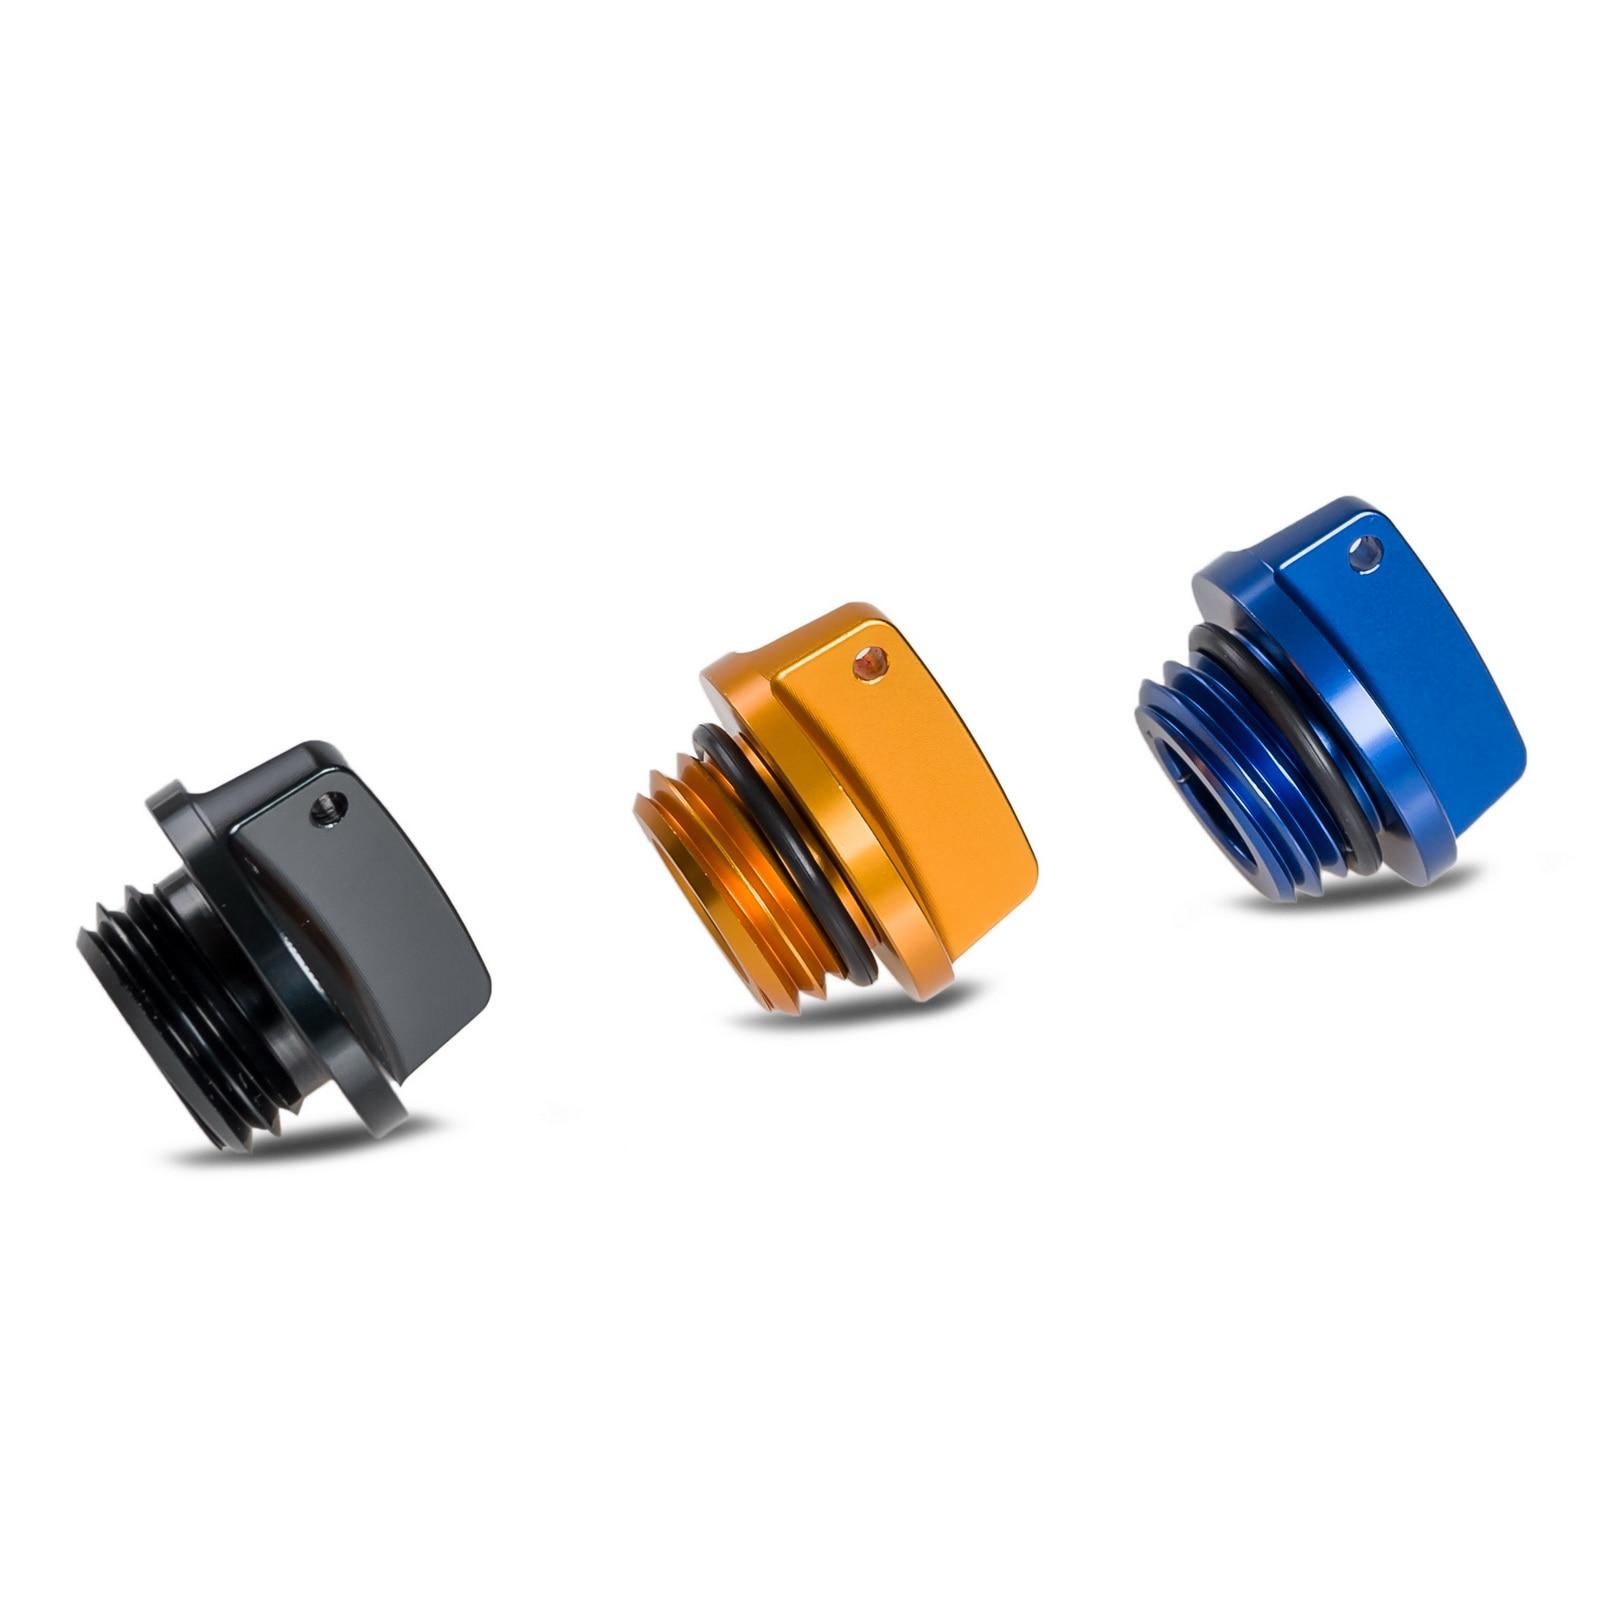 NICECNC Oil Filler Cap For Yamaha FZR250/R MT 03 07 25 YZF R1 R3 R6 R25 FZ400 FZ6 Fazer FZS600/S FZ6R FZ07 FZ8 XJR400 XJR1200 motorcycles supplies cnc aluminum oil filler cap plug for yamaha yzf r1 r6 r6s yzf600r 750r 1000r